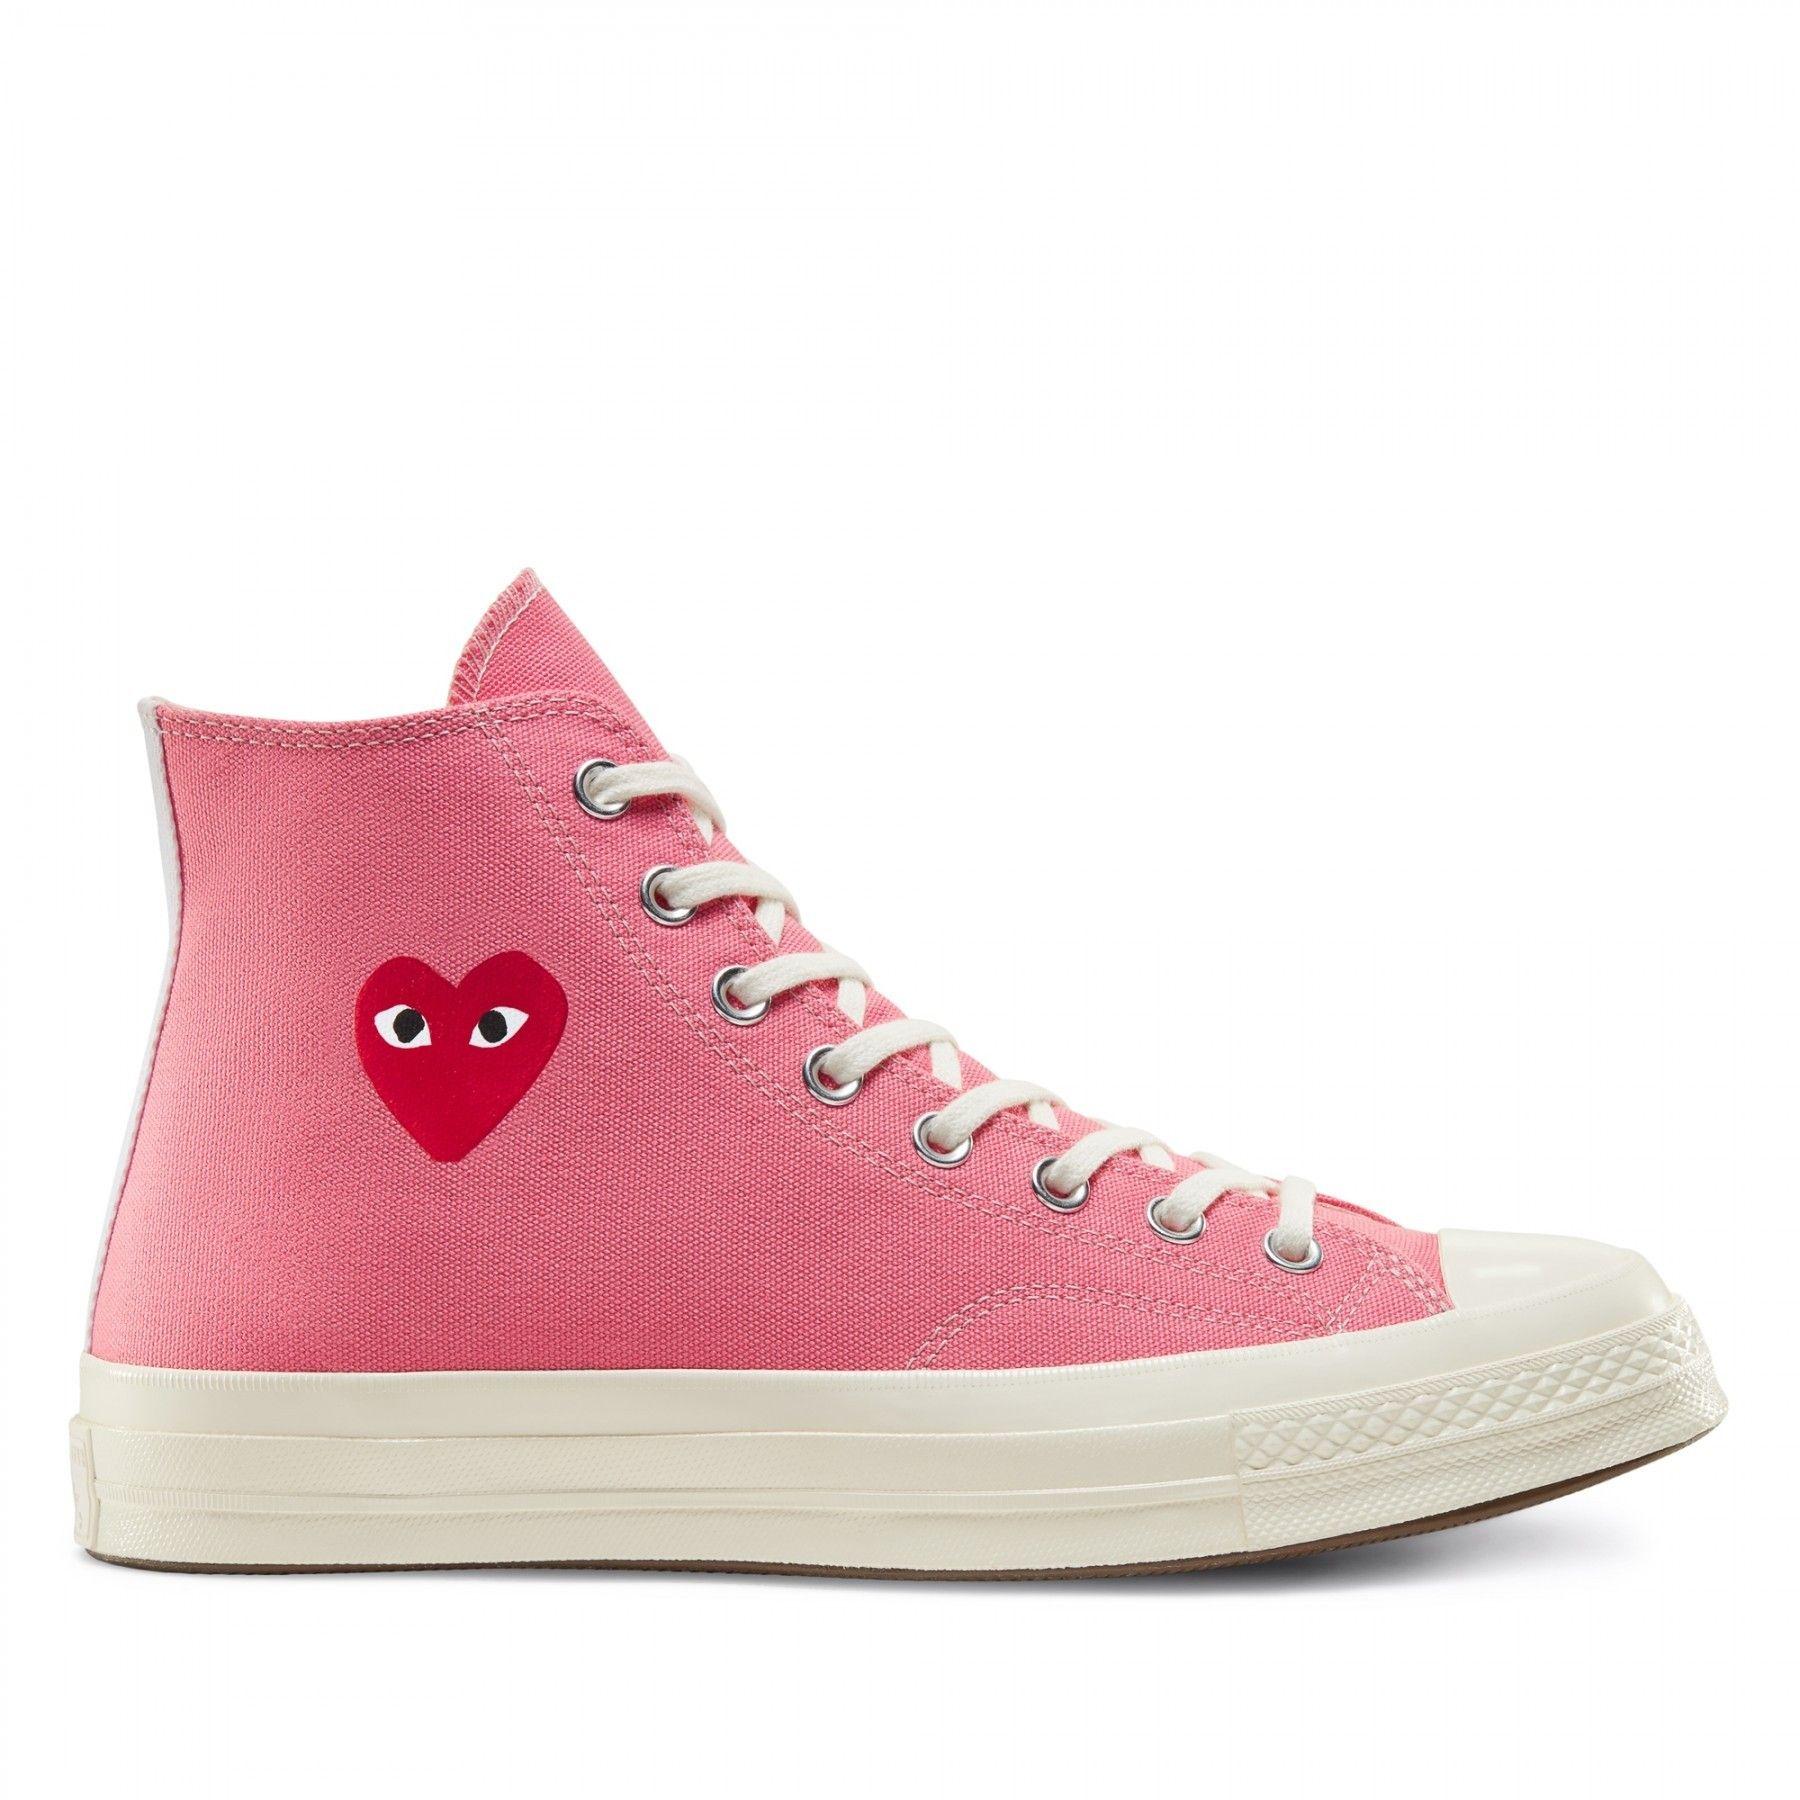 Pink high top converse, Chuck taylors